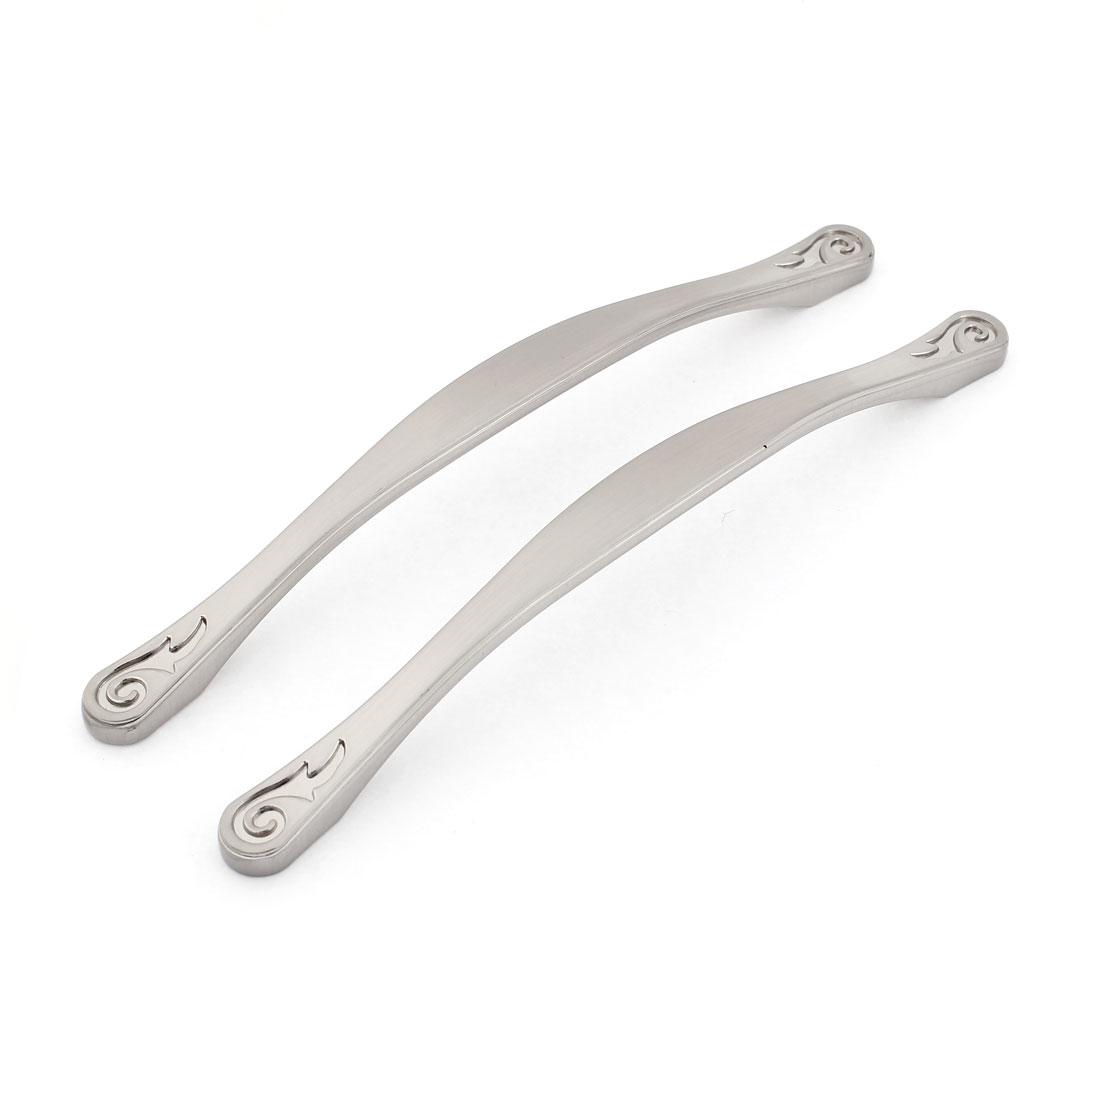 2pcs 18.5cm Long Zinc Alloy Arch Knobs Cabinet Door Pull Handles Hardware 160mm